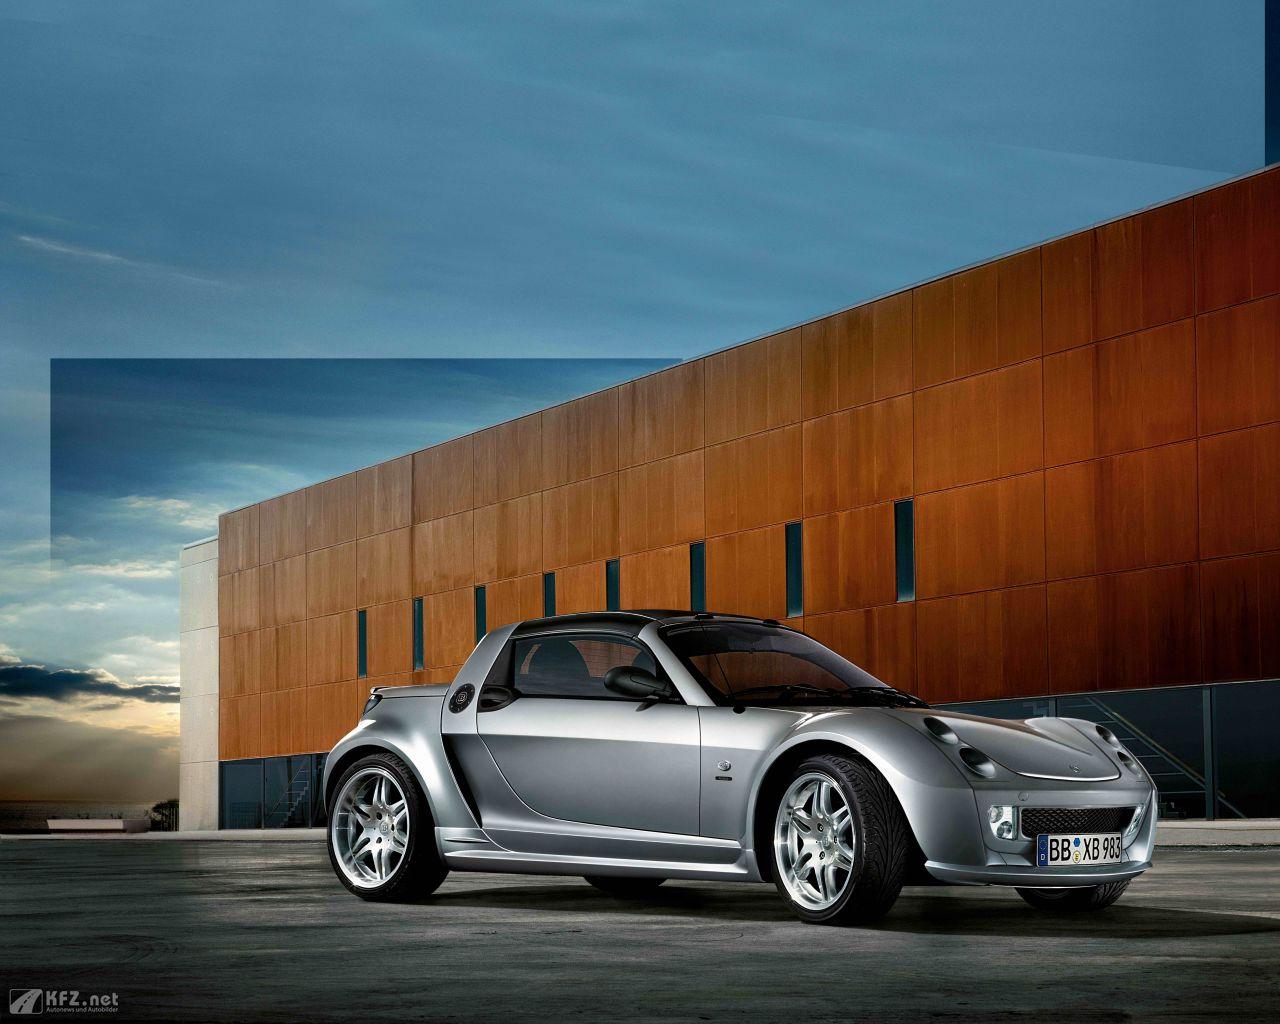 smart-roadster-1280x1024-1